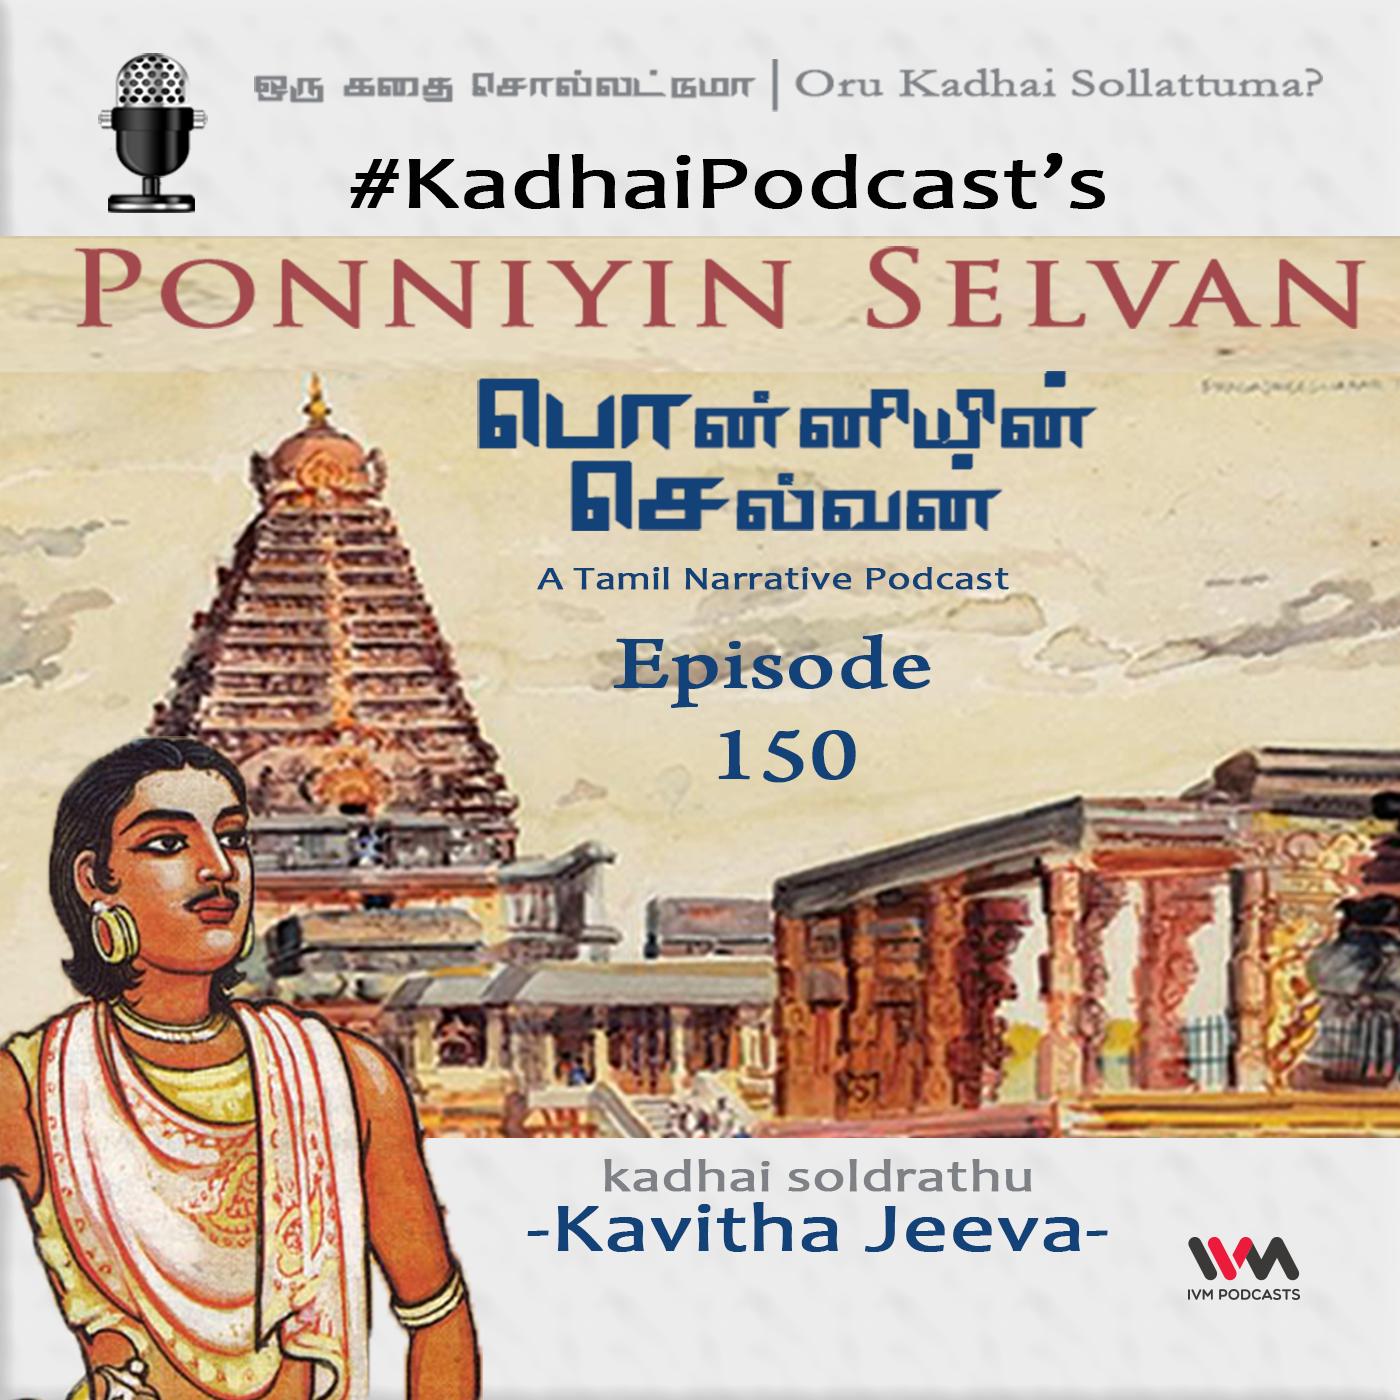 KadhaiPodcast's Ponniyin Selvan - Episode # 150